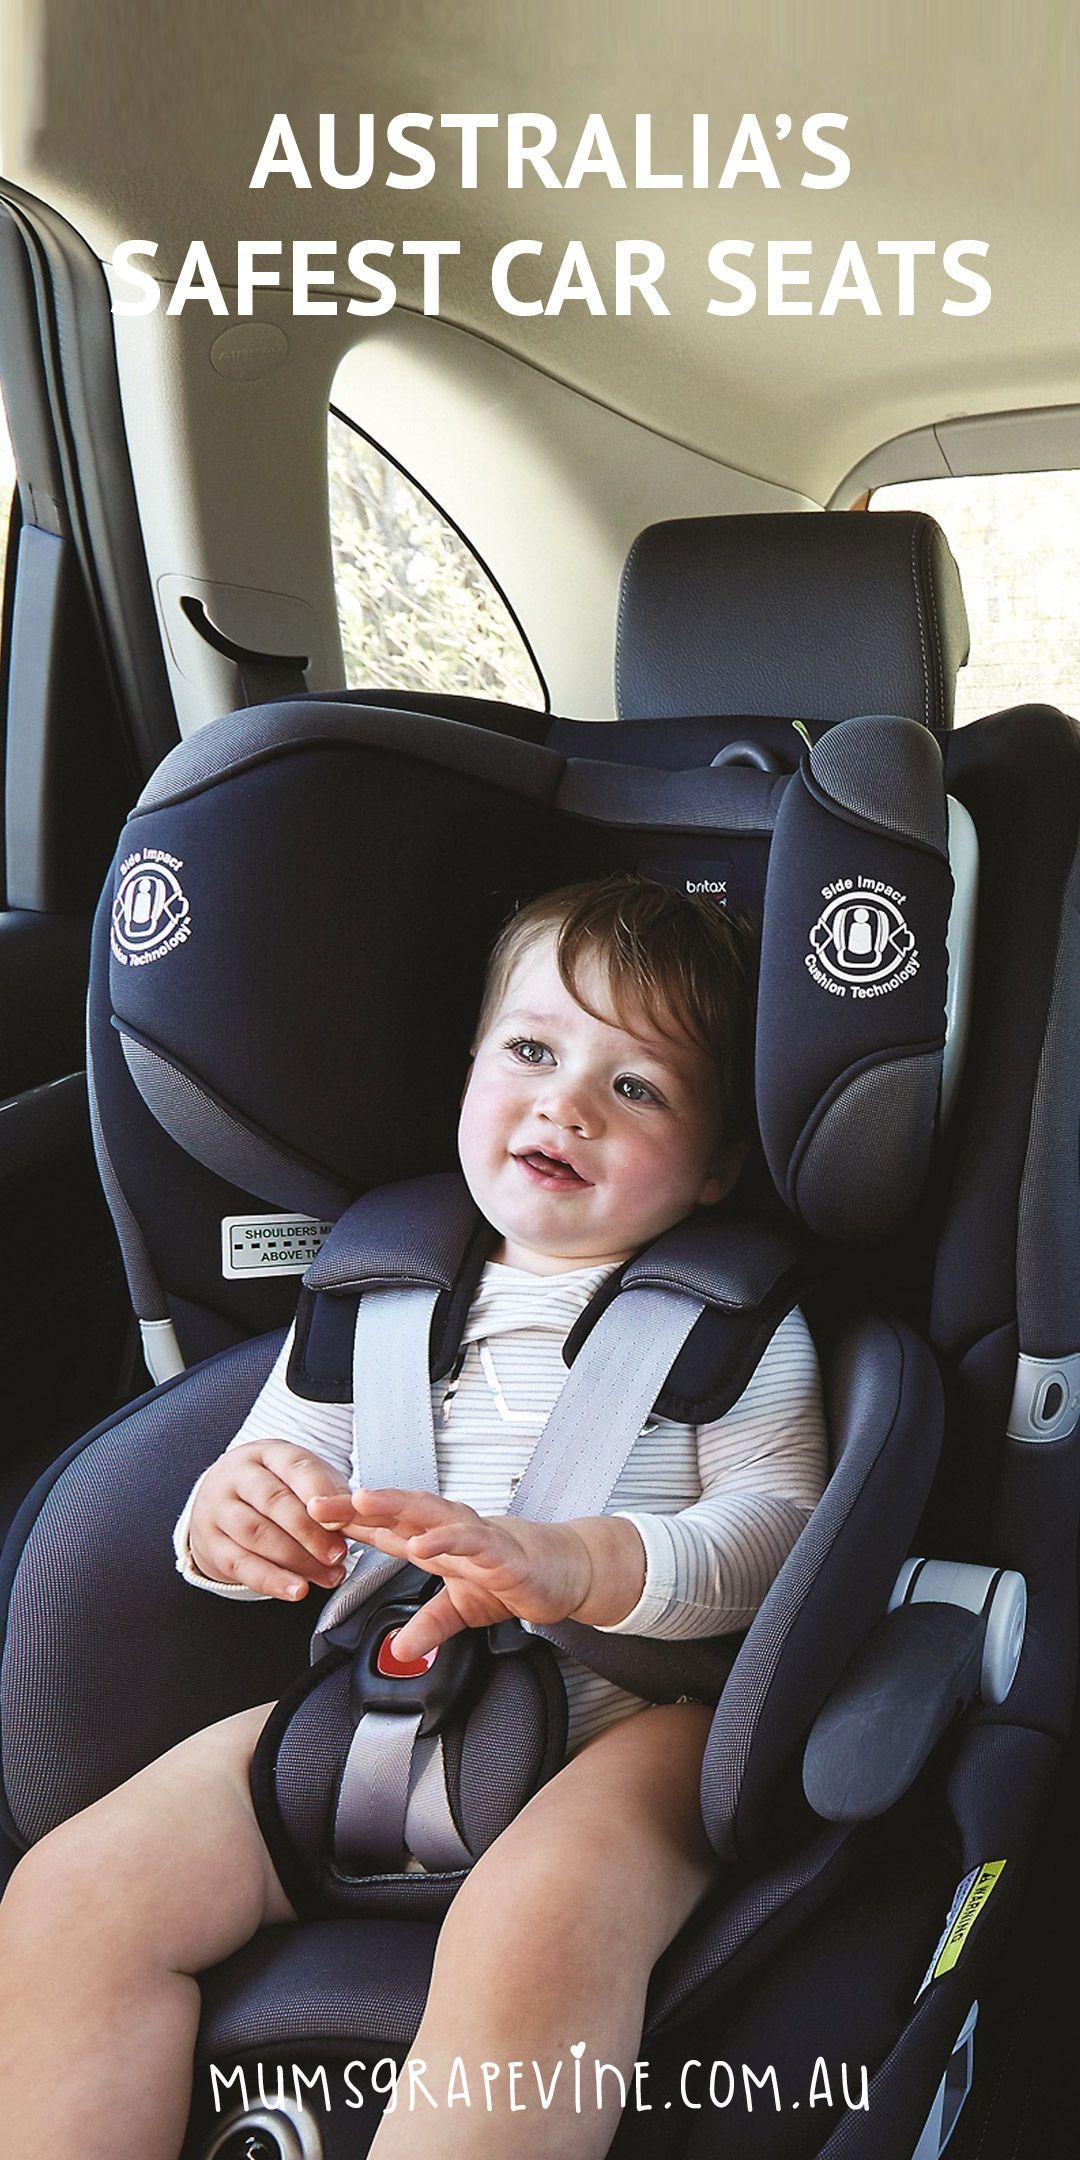 Motoring organisation reveals Australia's safest car seats, booster